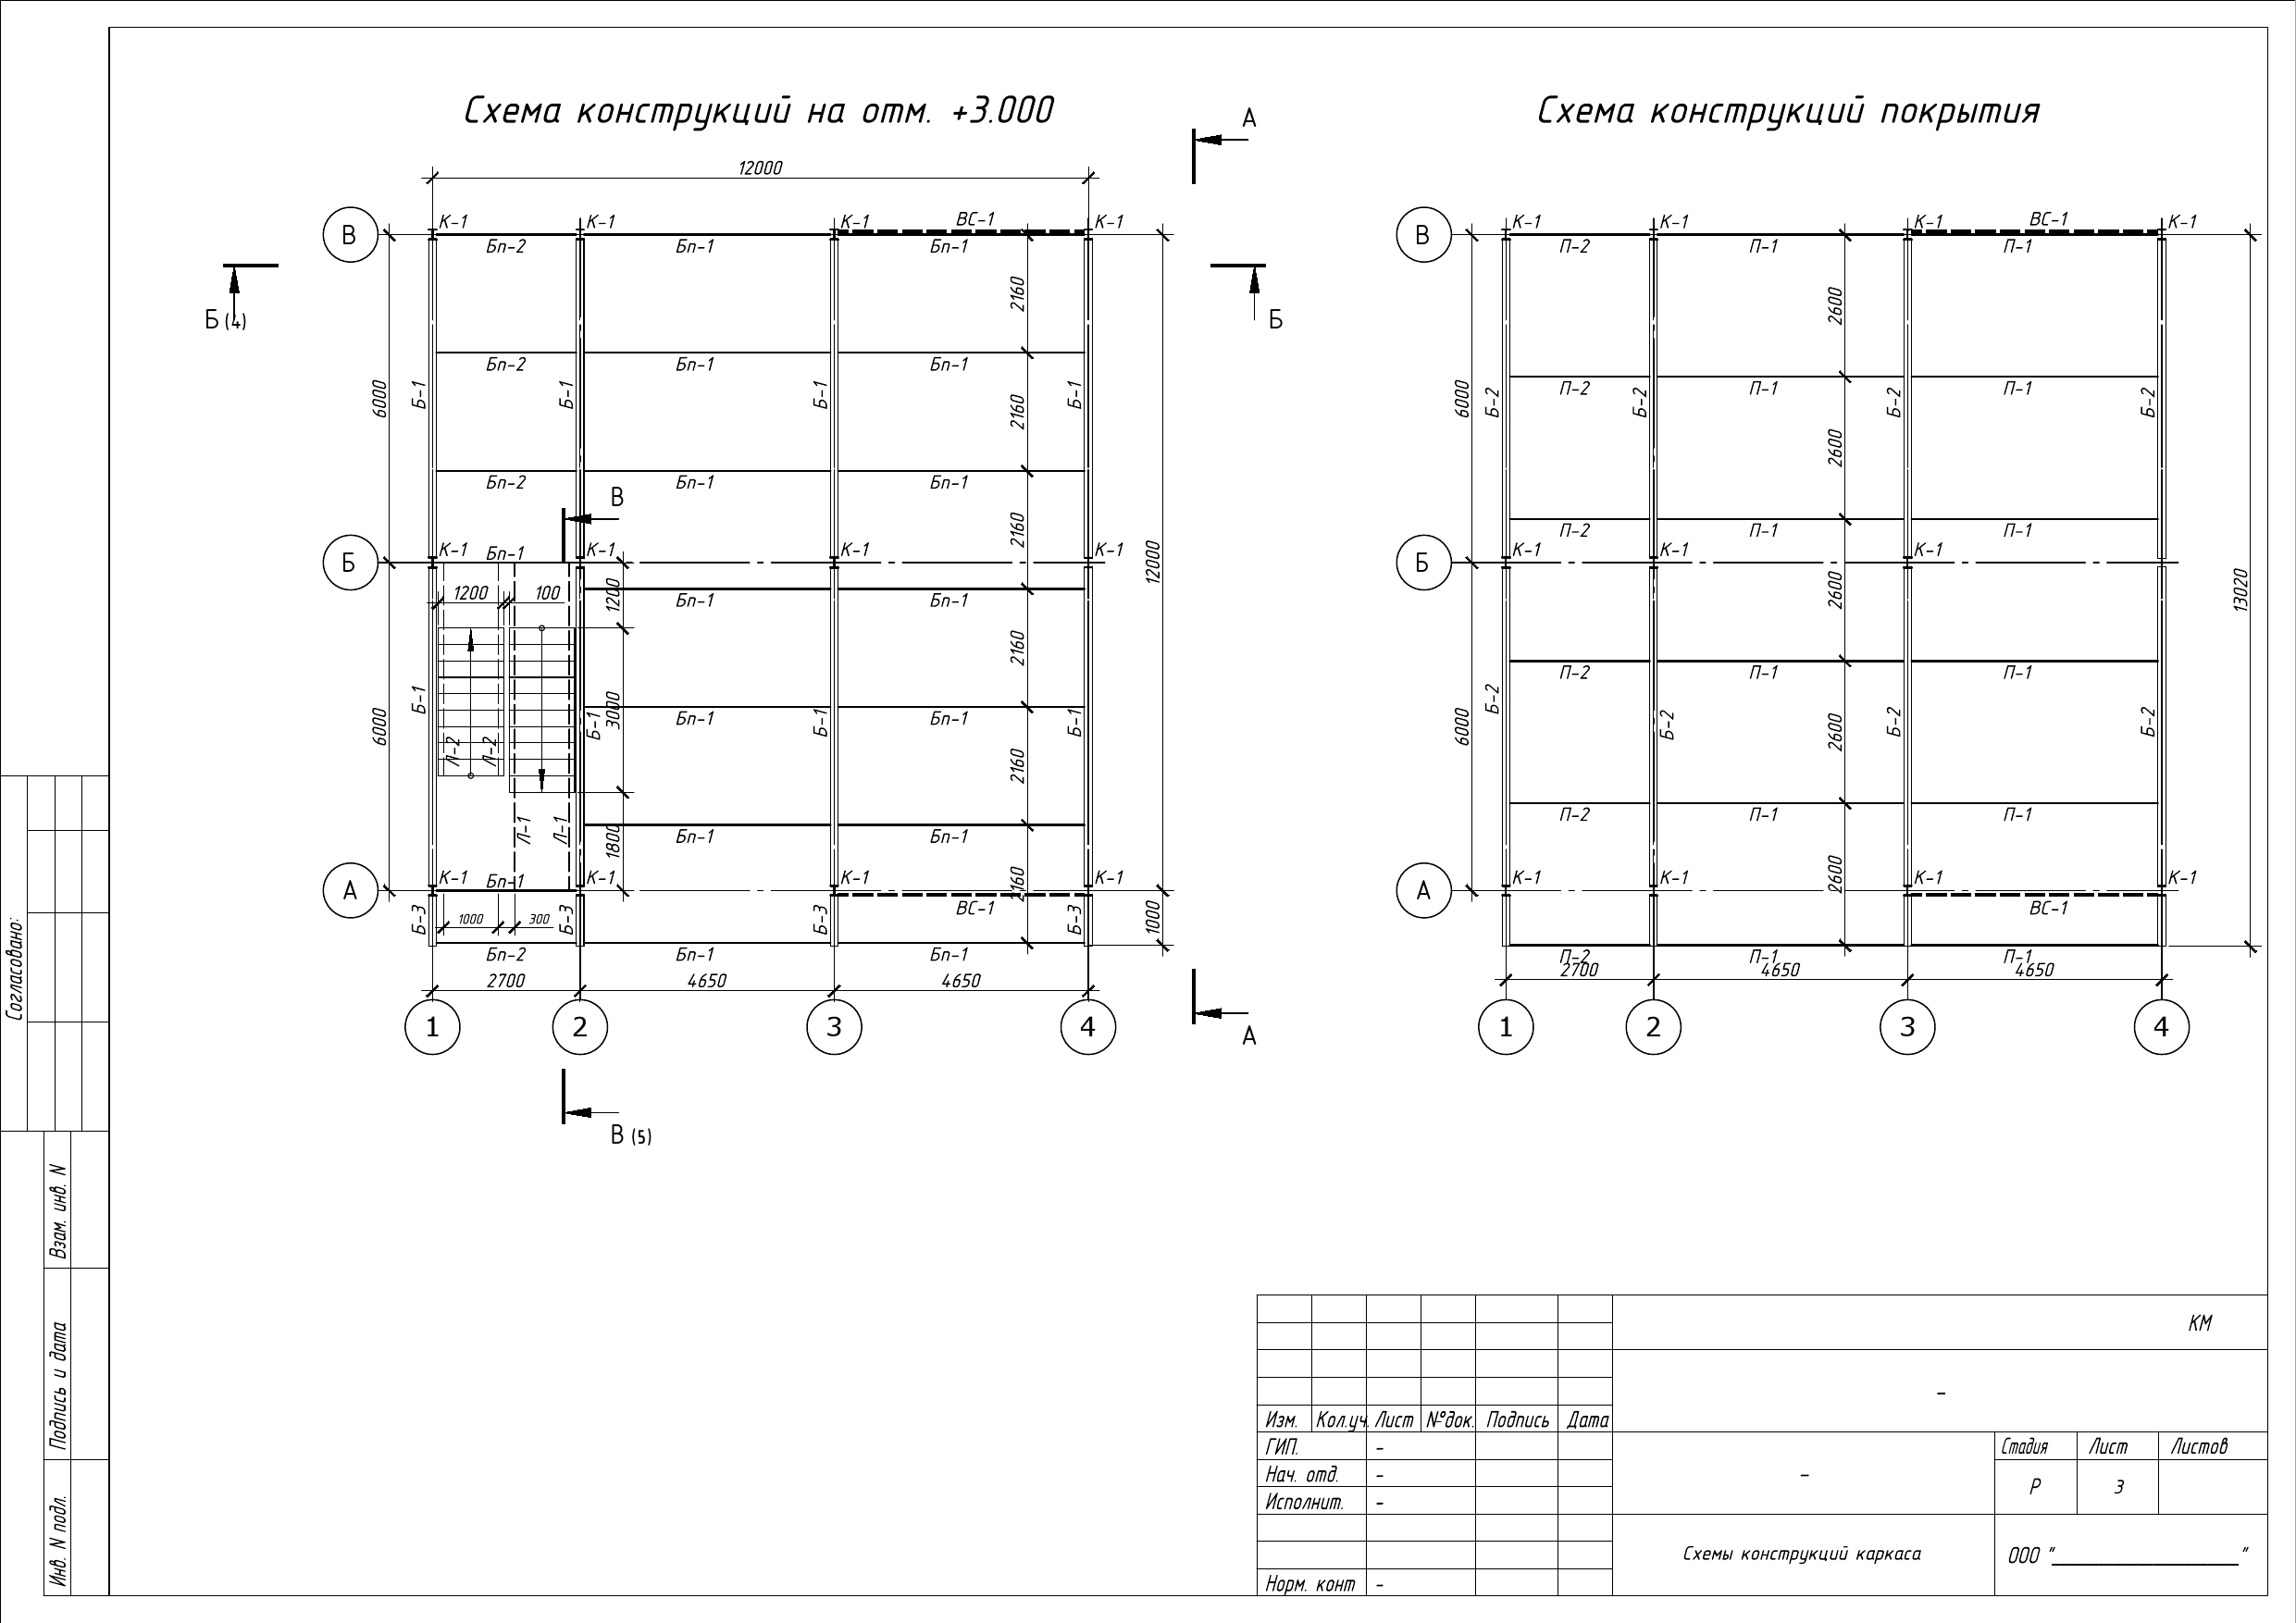 Чертежи металлоконструкций АБК-3